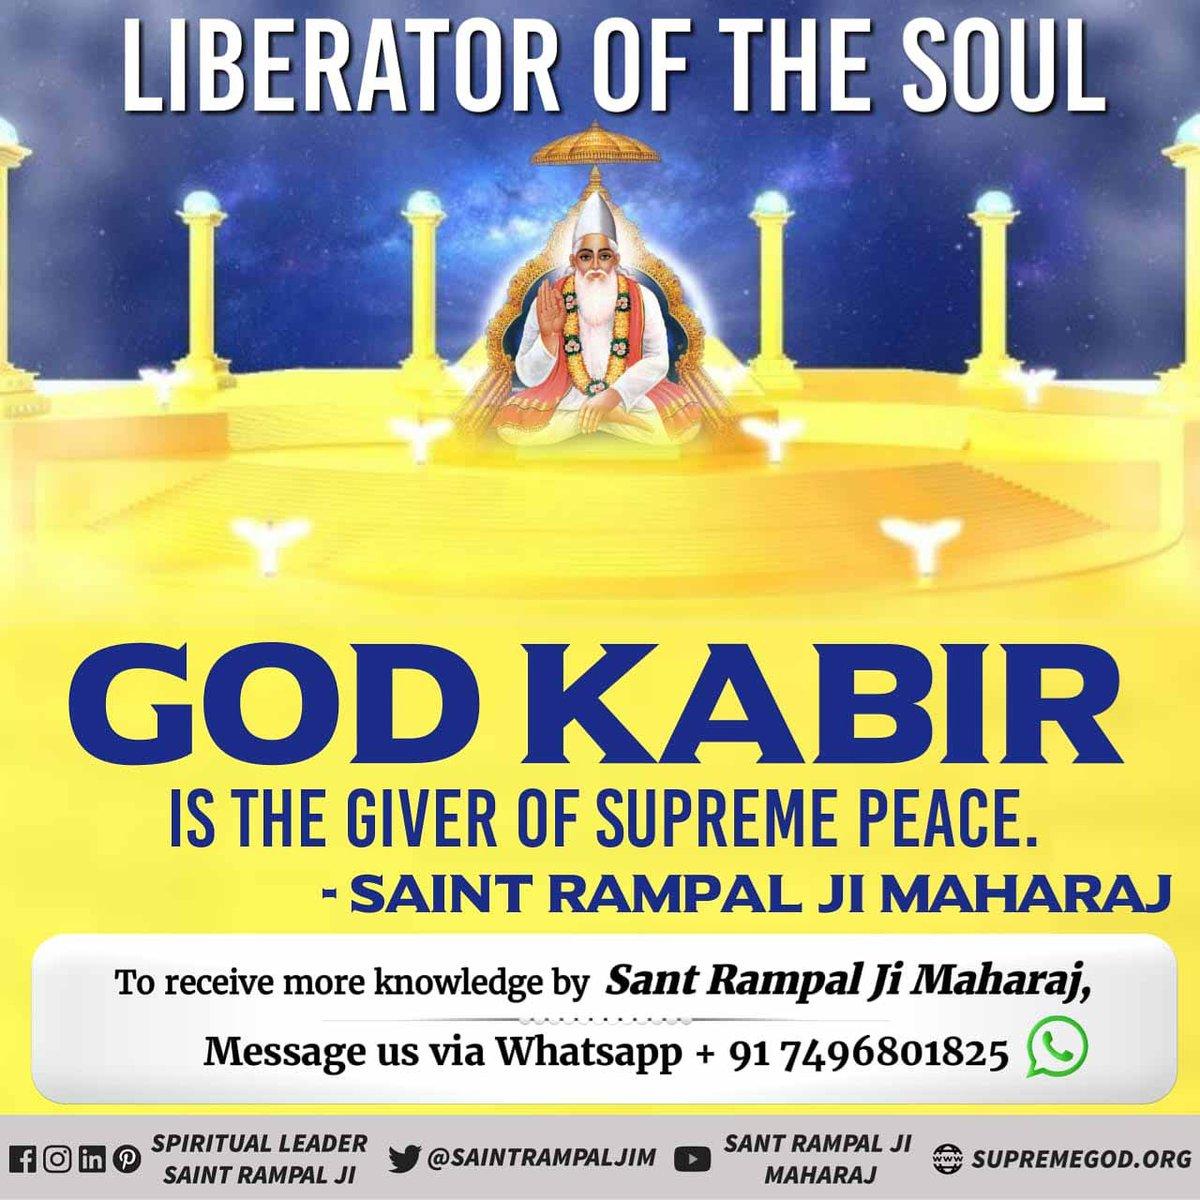 """God kabir"" . . . . . .  #gita #shree #krishna #mandir #vishnu #hindiquotes #hindiwriter #hindiwriters #hindiquote #waqt #hindiwriting #hindipoetry #harekrishna #lordkrishna #radha #bhakti #gujju #gujarat #mathura #vrindavan #mahabharat #bhagavadgita #kurukshetra #haryana #indiapic.twitter.com/JqmN15MlJw"